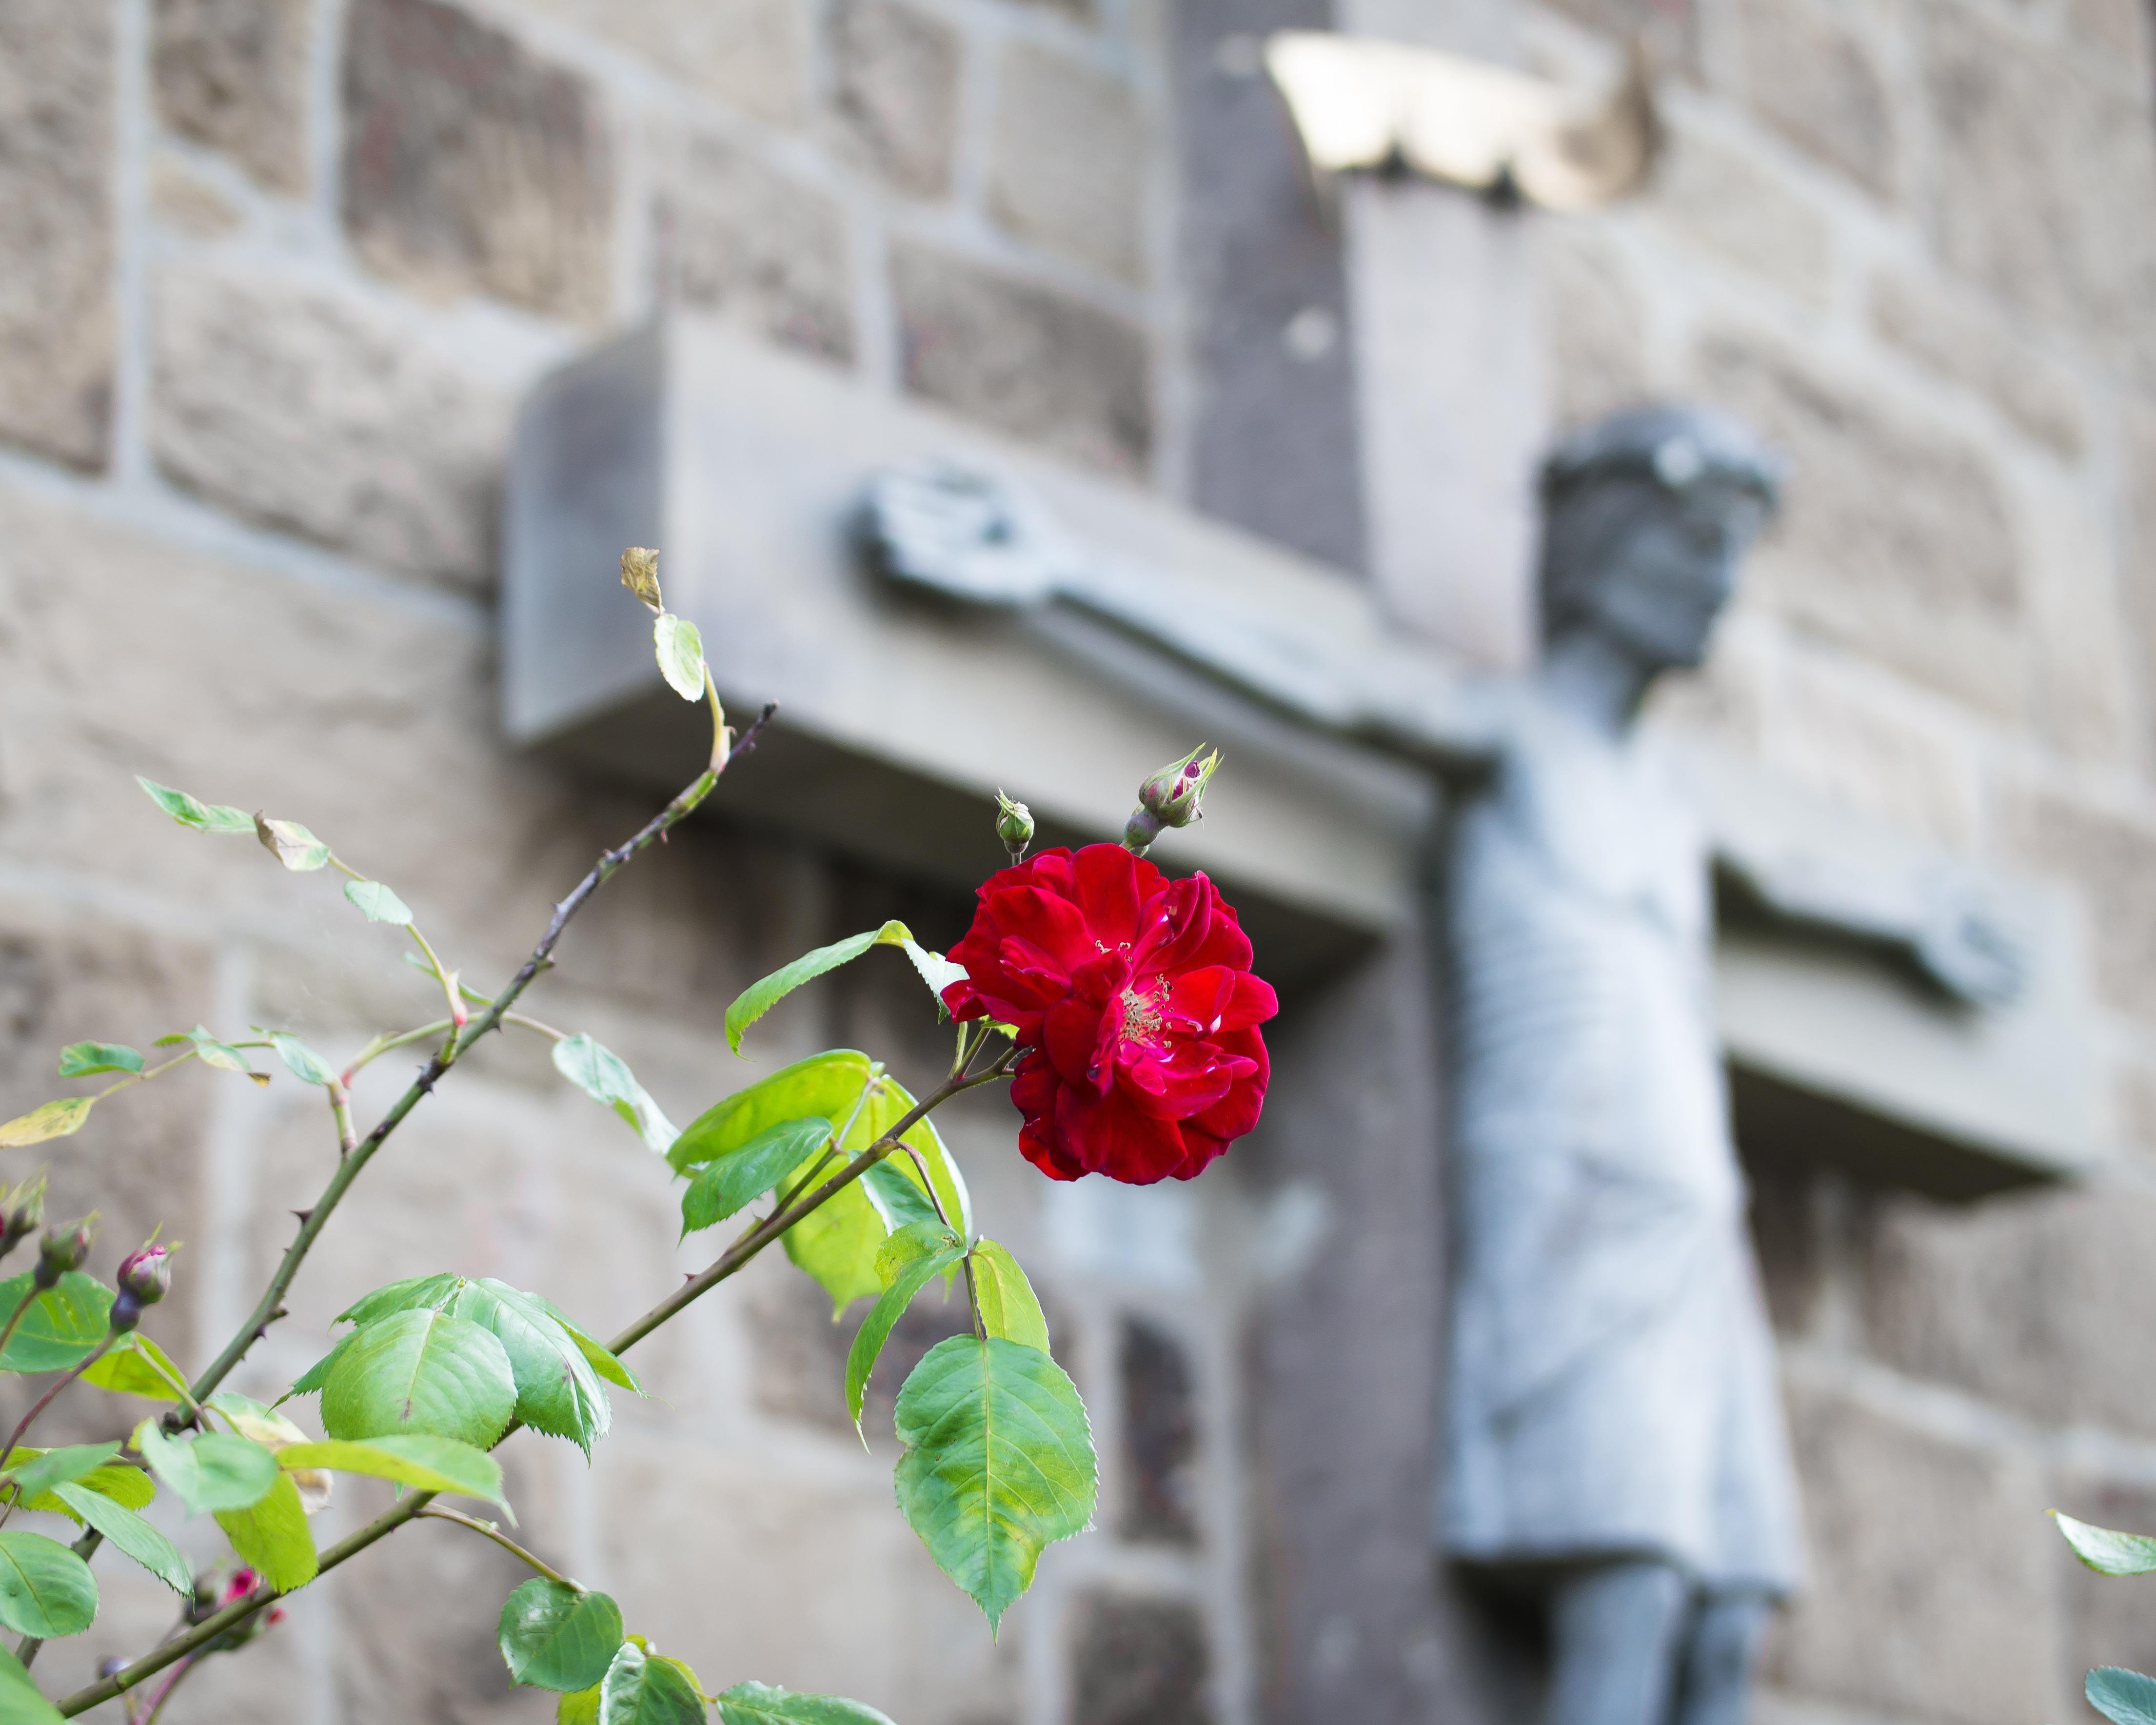 Fotos gratis : planta, hoja, flor, Rosa, primavera, verde, rojo ...